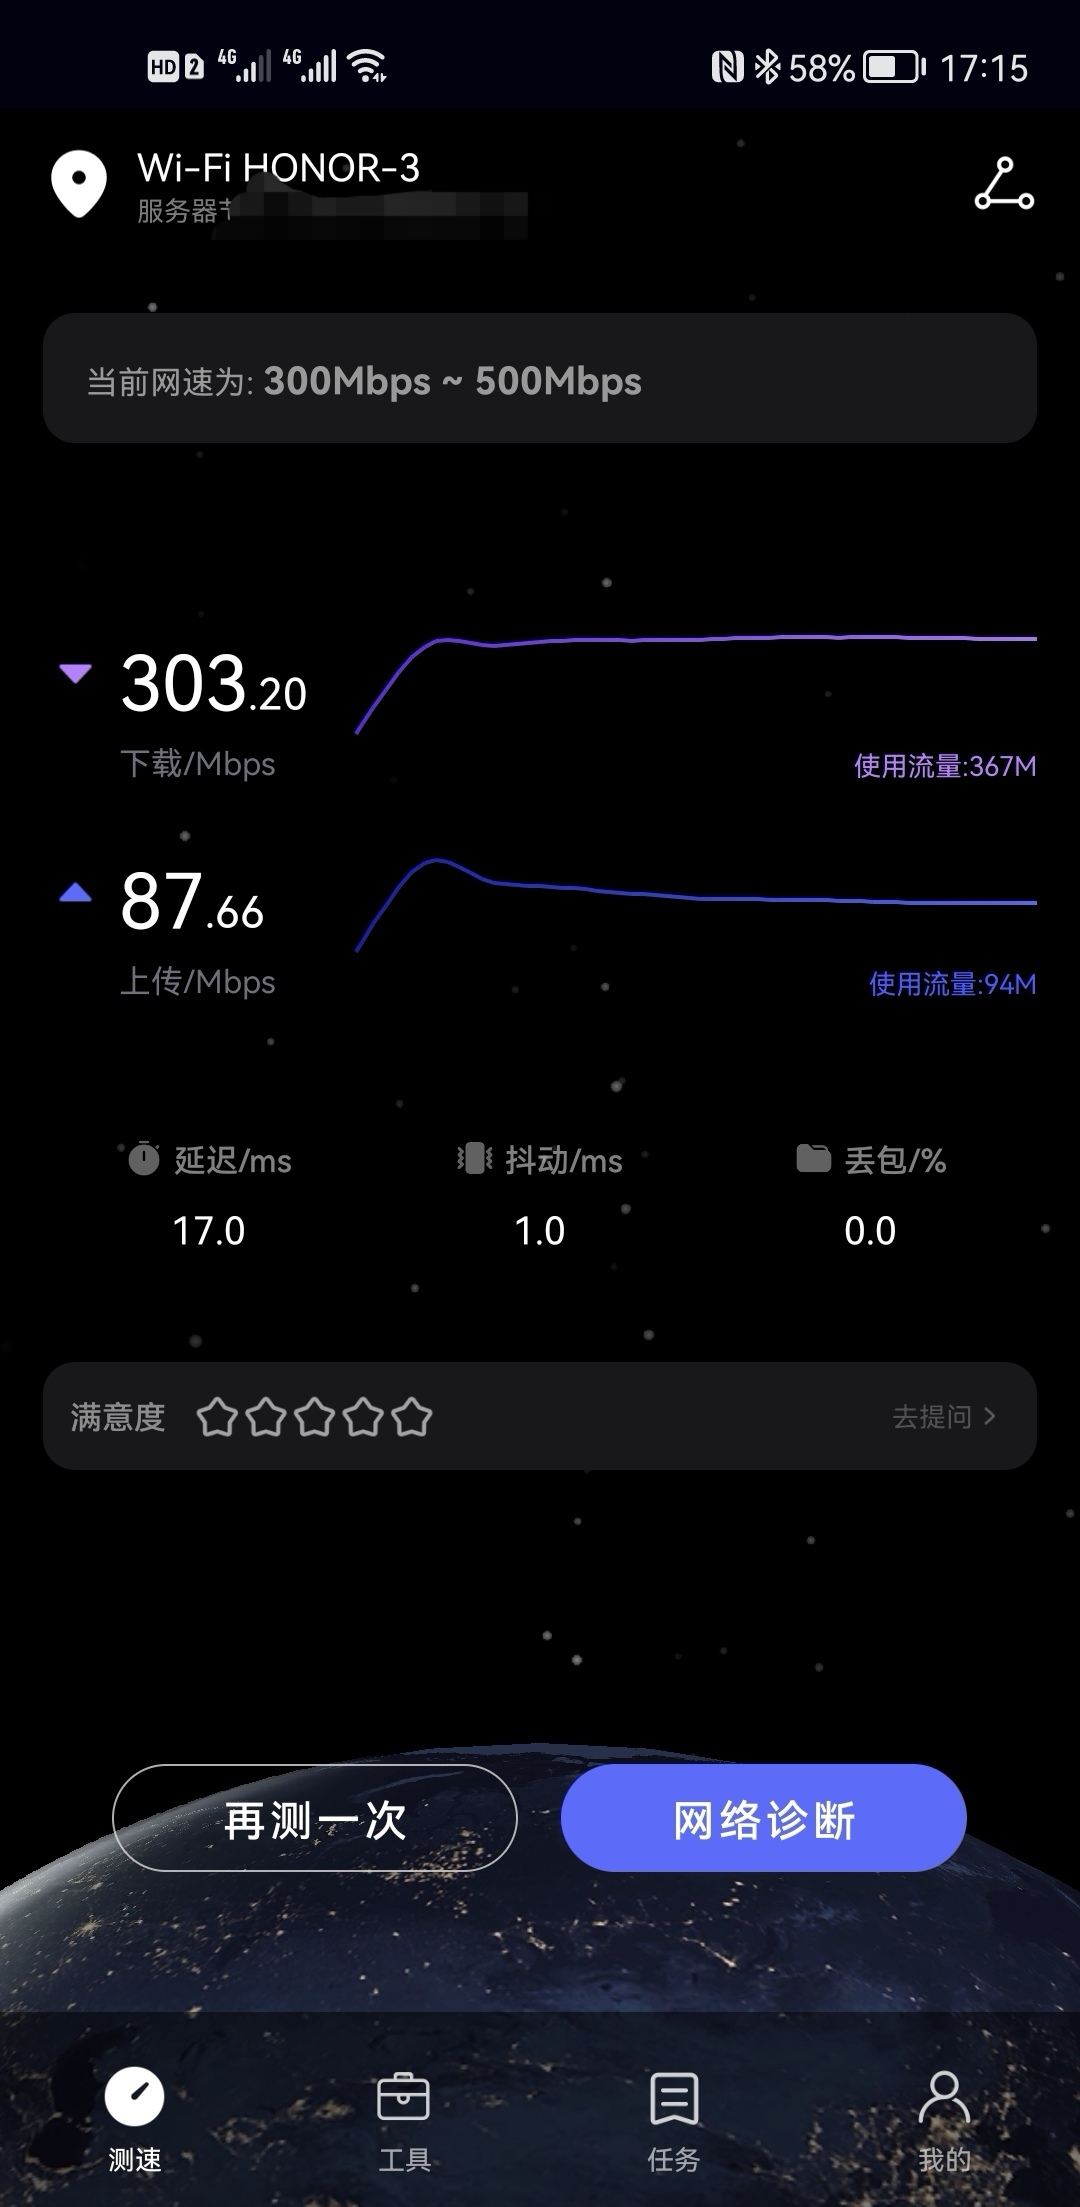 Screenshot_20211012_171538_com.huawei.genexcloud.speedtest_edit_1304866983573287.jpg